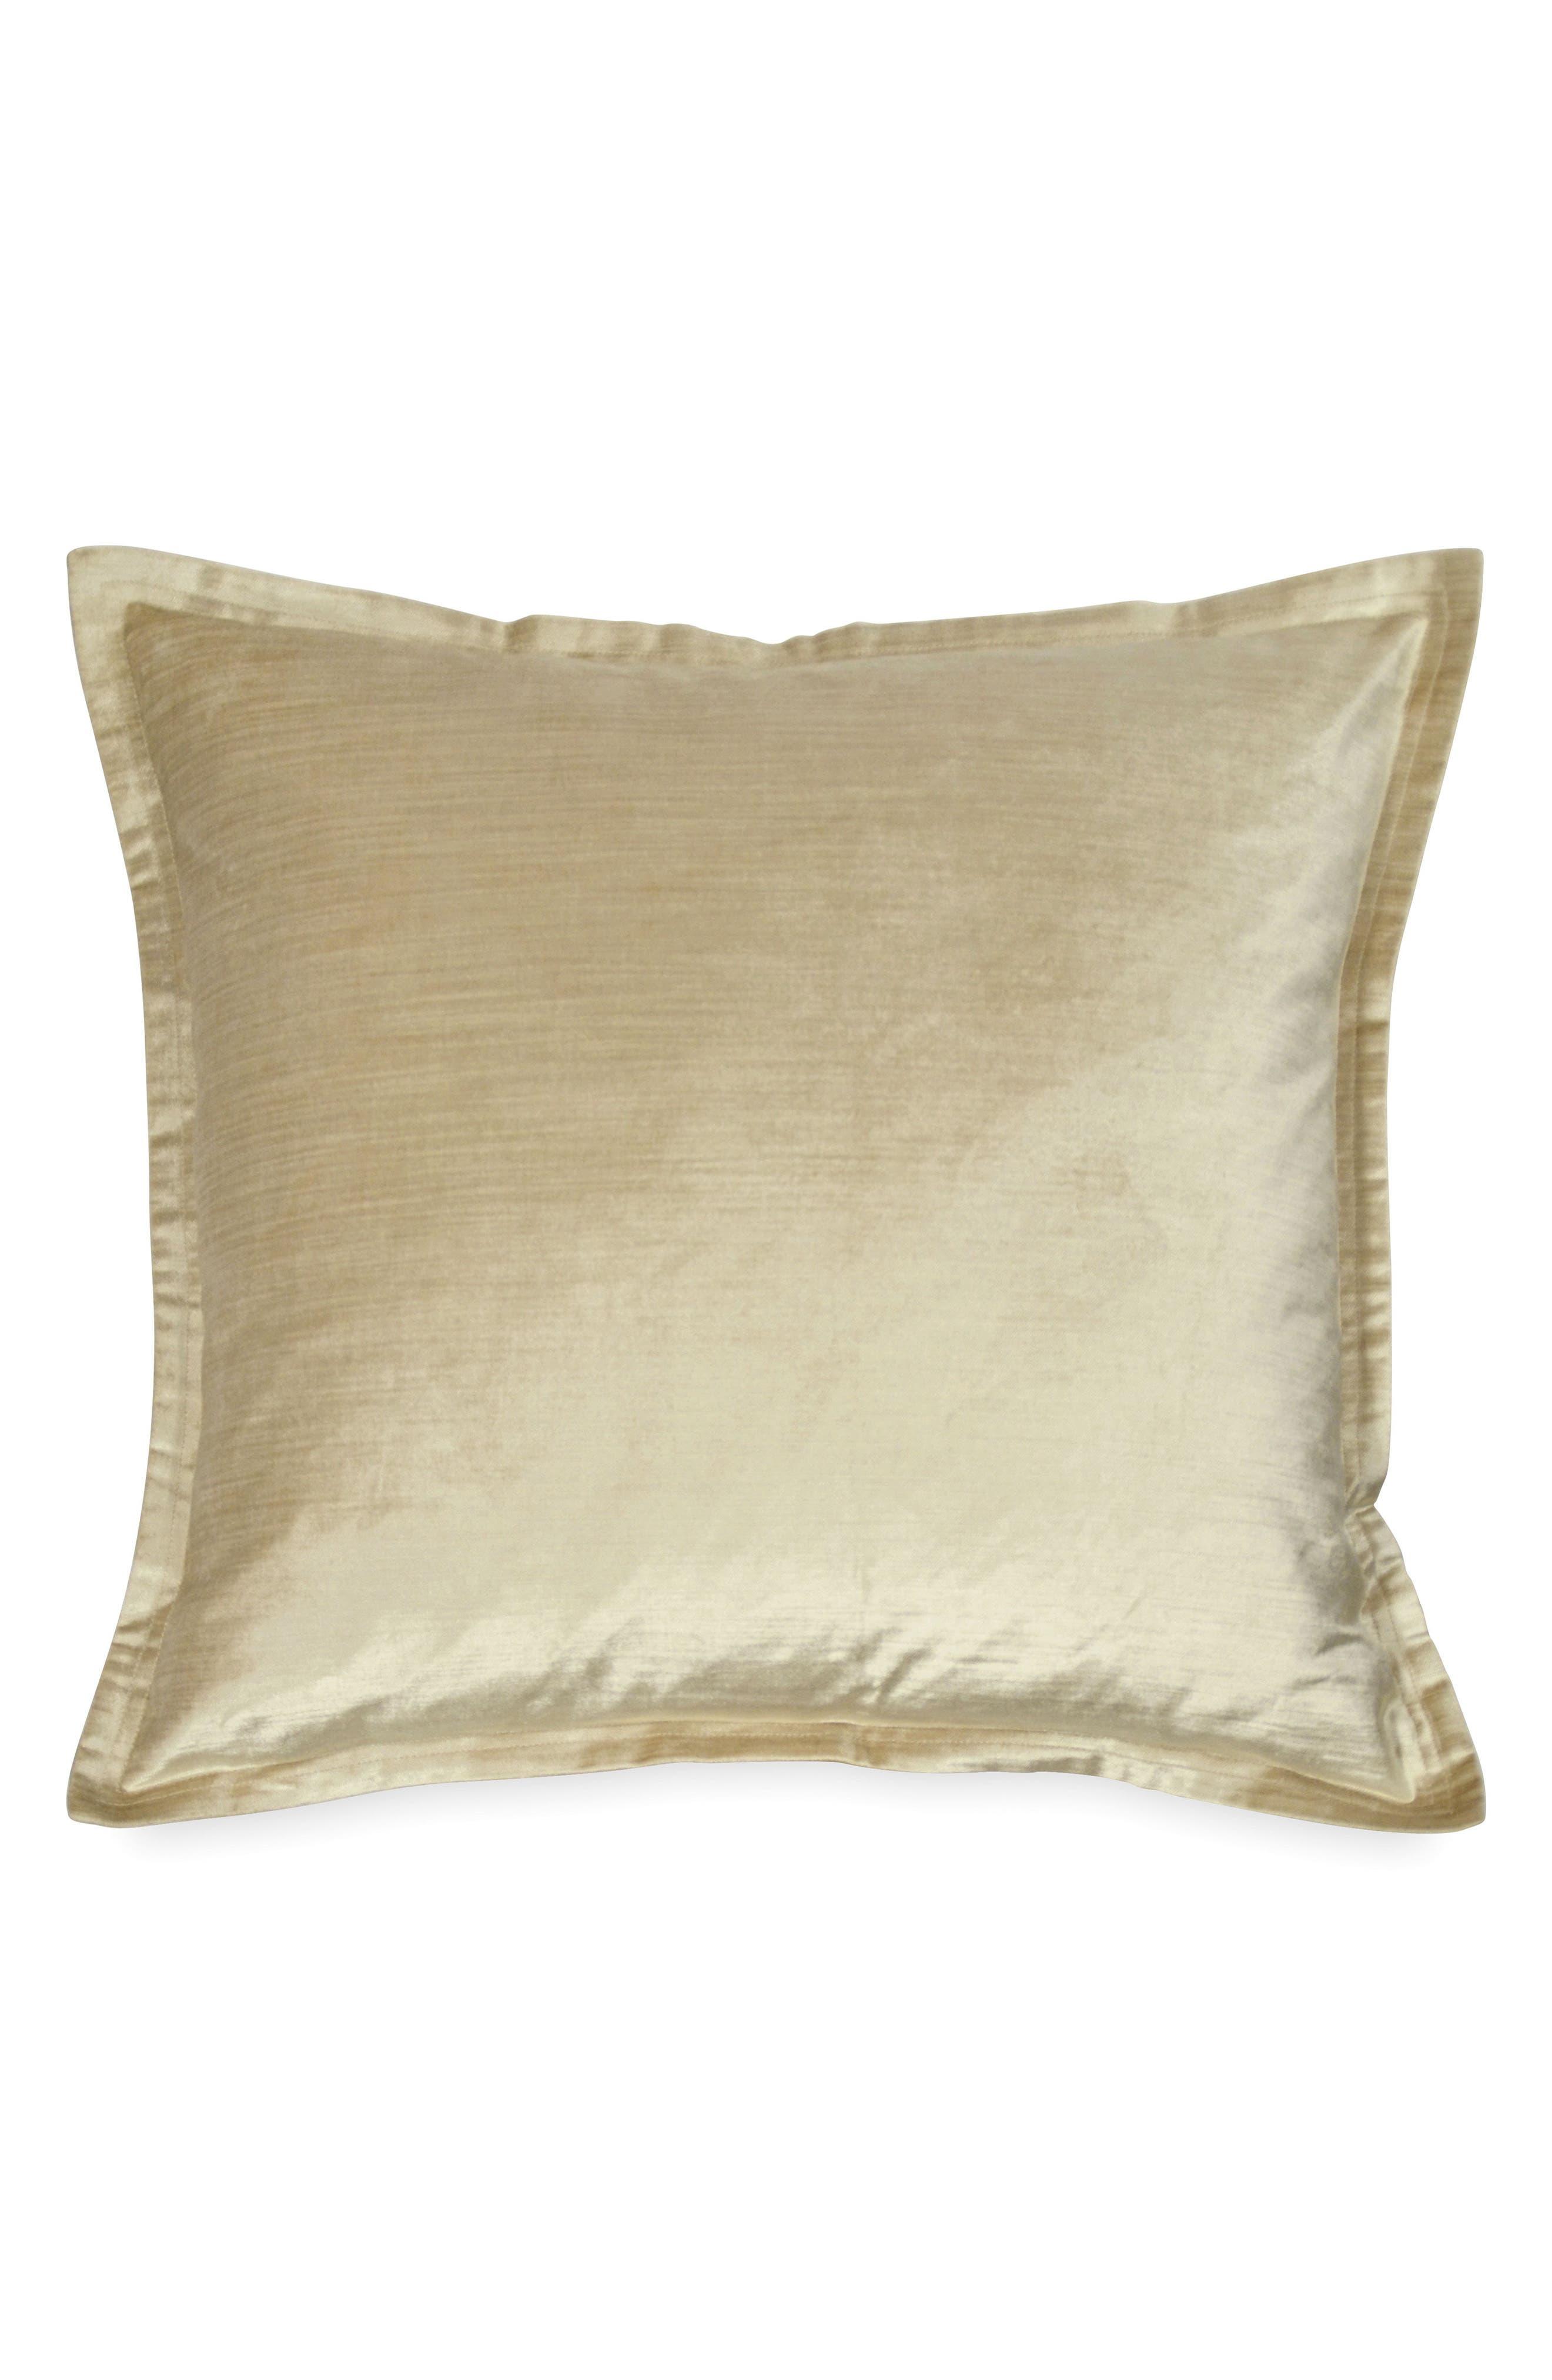 DONNA KARAN NEW YORK, Donna Karan Velvet Accent Pillow, Main thumbnail 1, color, GOLD DUST